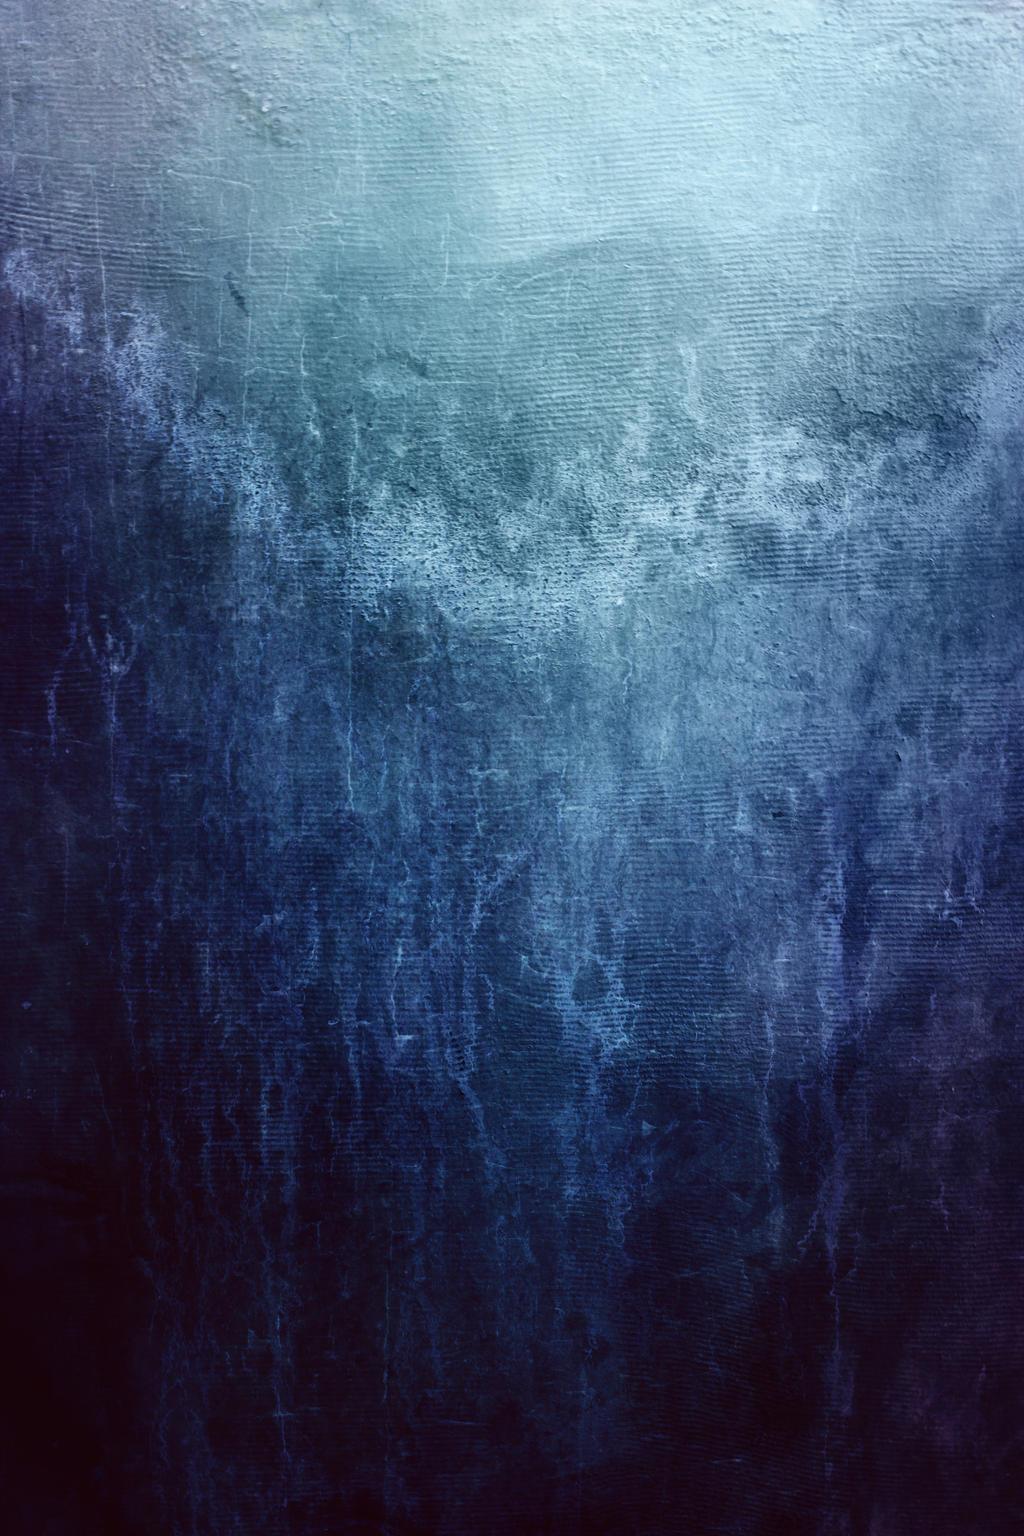 Digital Art Texture 67